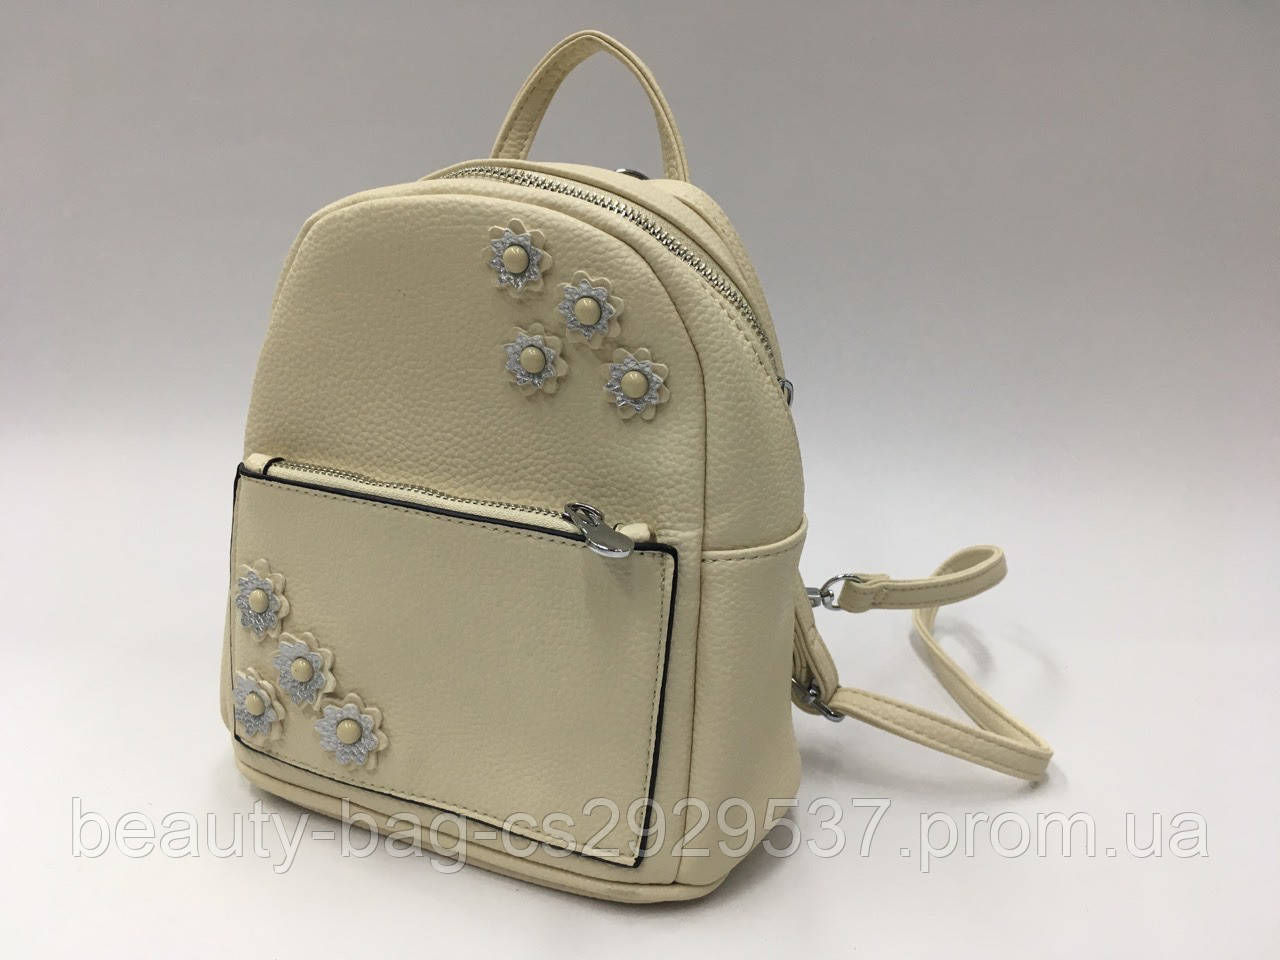 Рюкзак молодежный GJ-28 beige бежевый